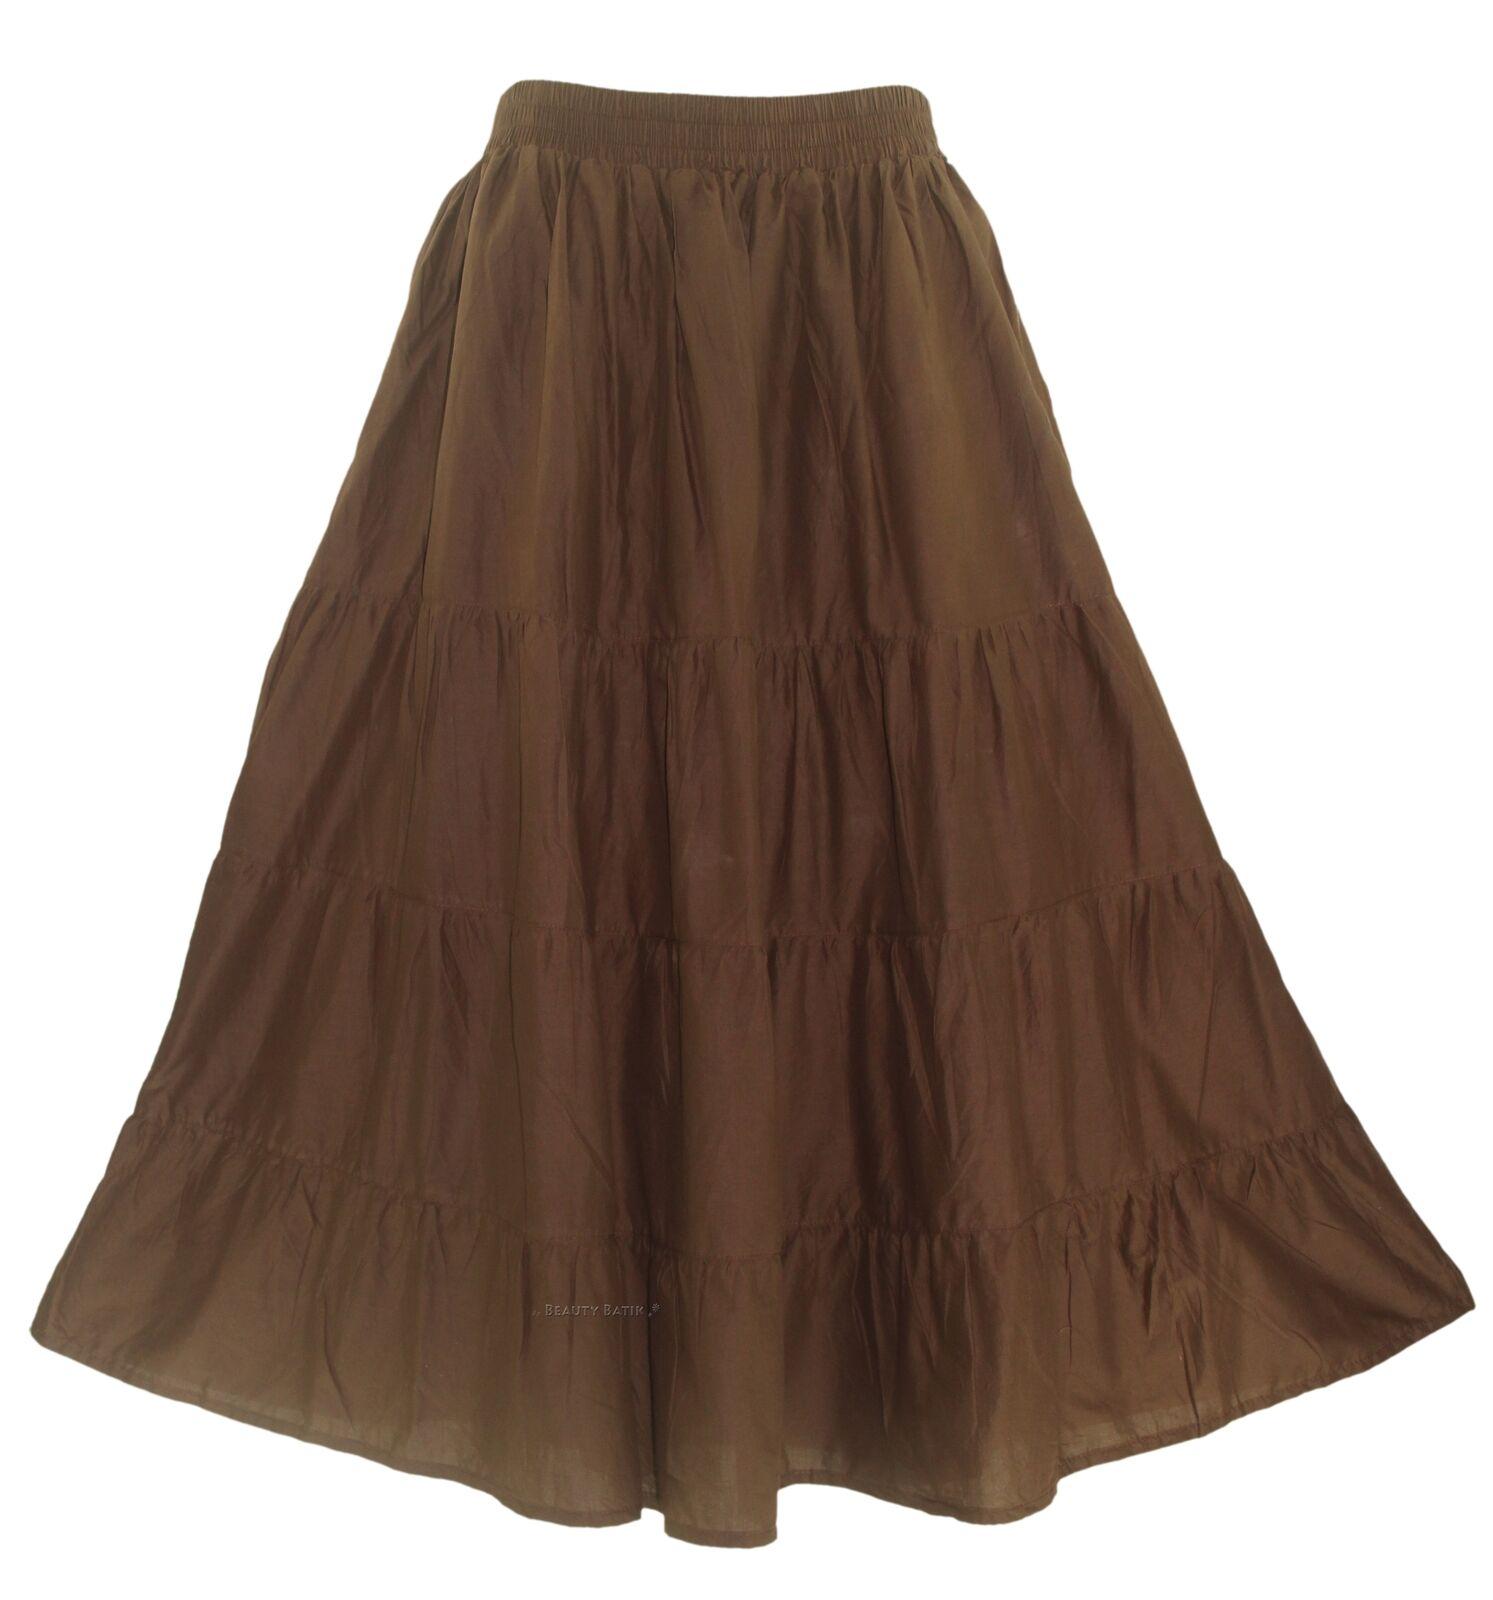 Brown Women Cotton BOHO Gypsy Long Maxi Tier Flare Skirt XL 18